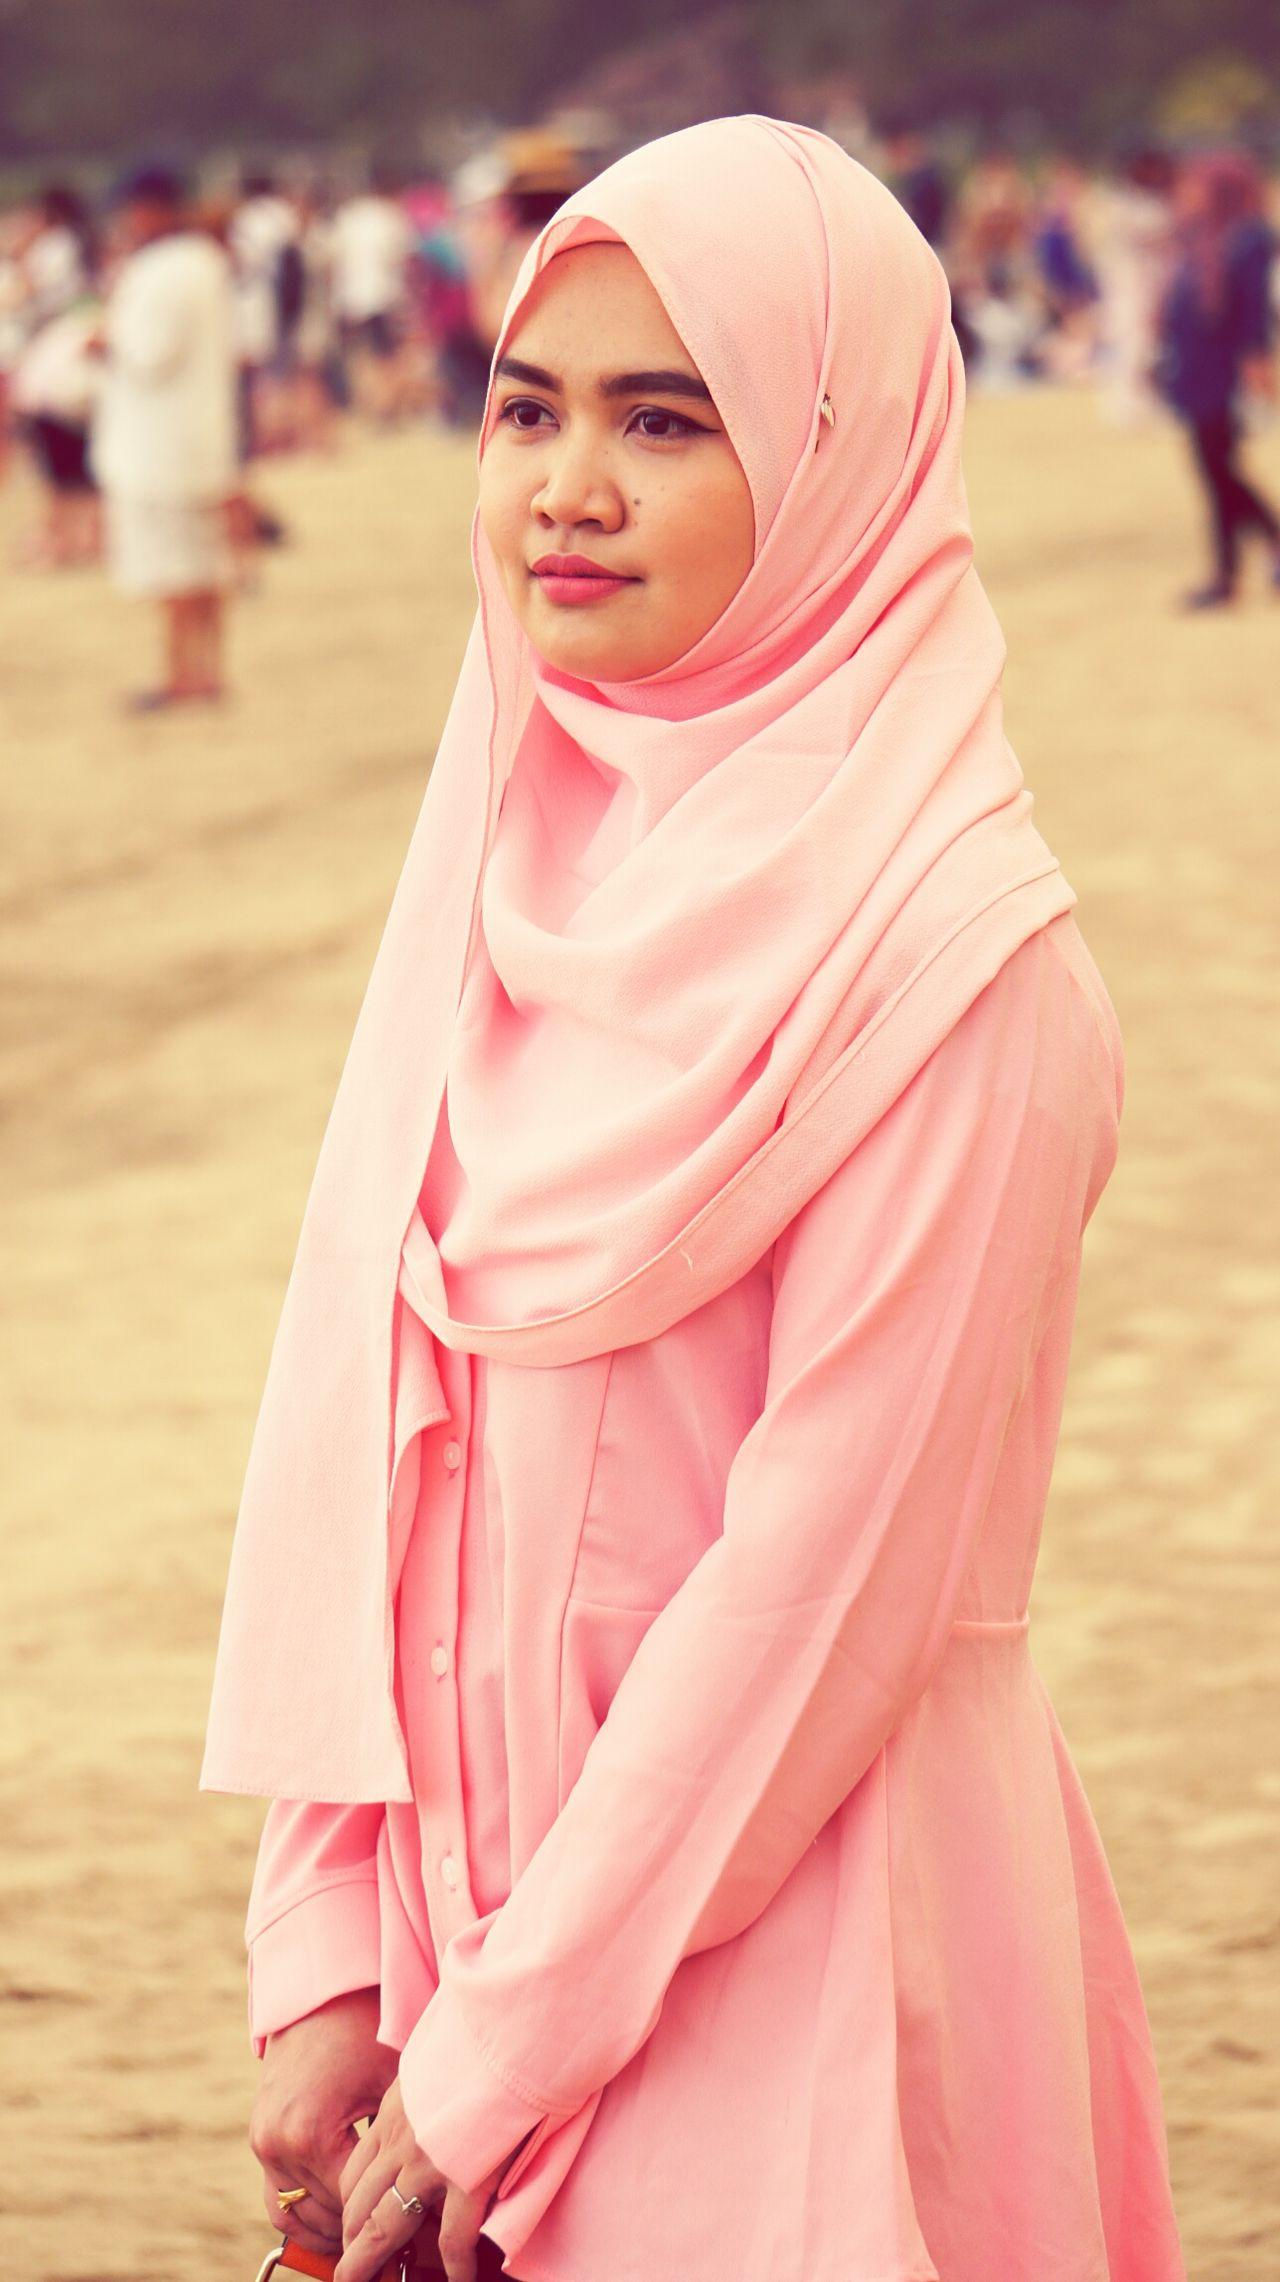 Hijab Traditional Clothing Women Around The World Muslimahfashion Portrait New Generation Photographer 55-210 F4.5-6.3